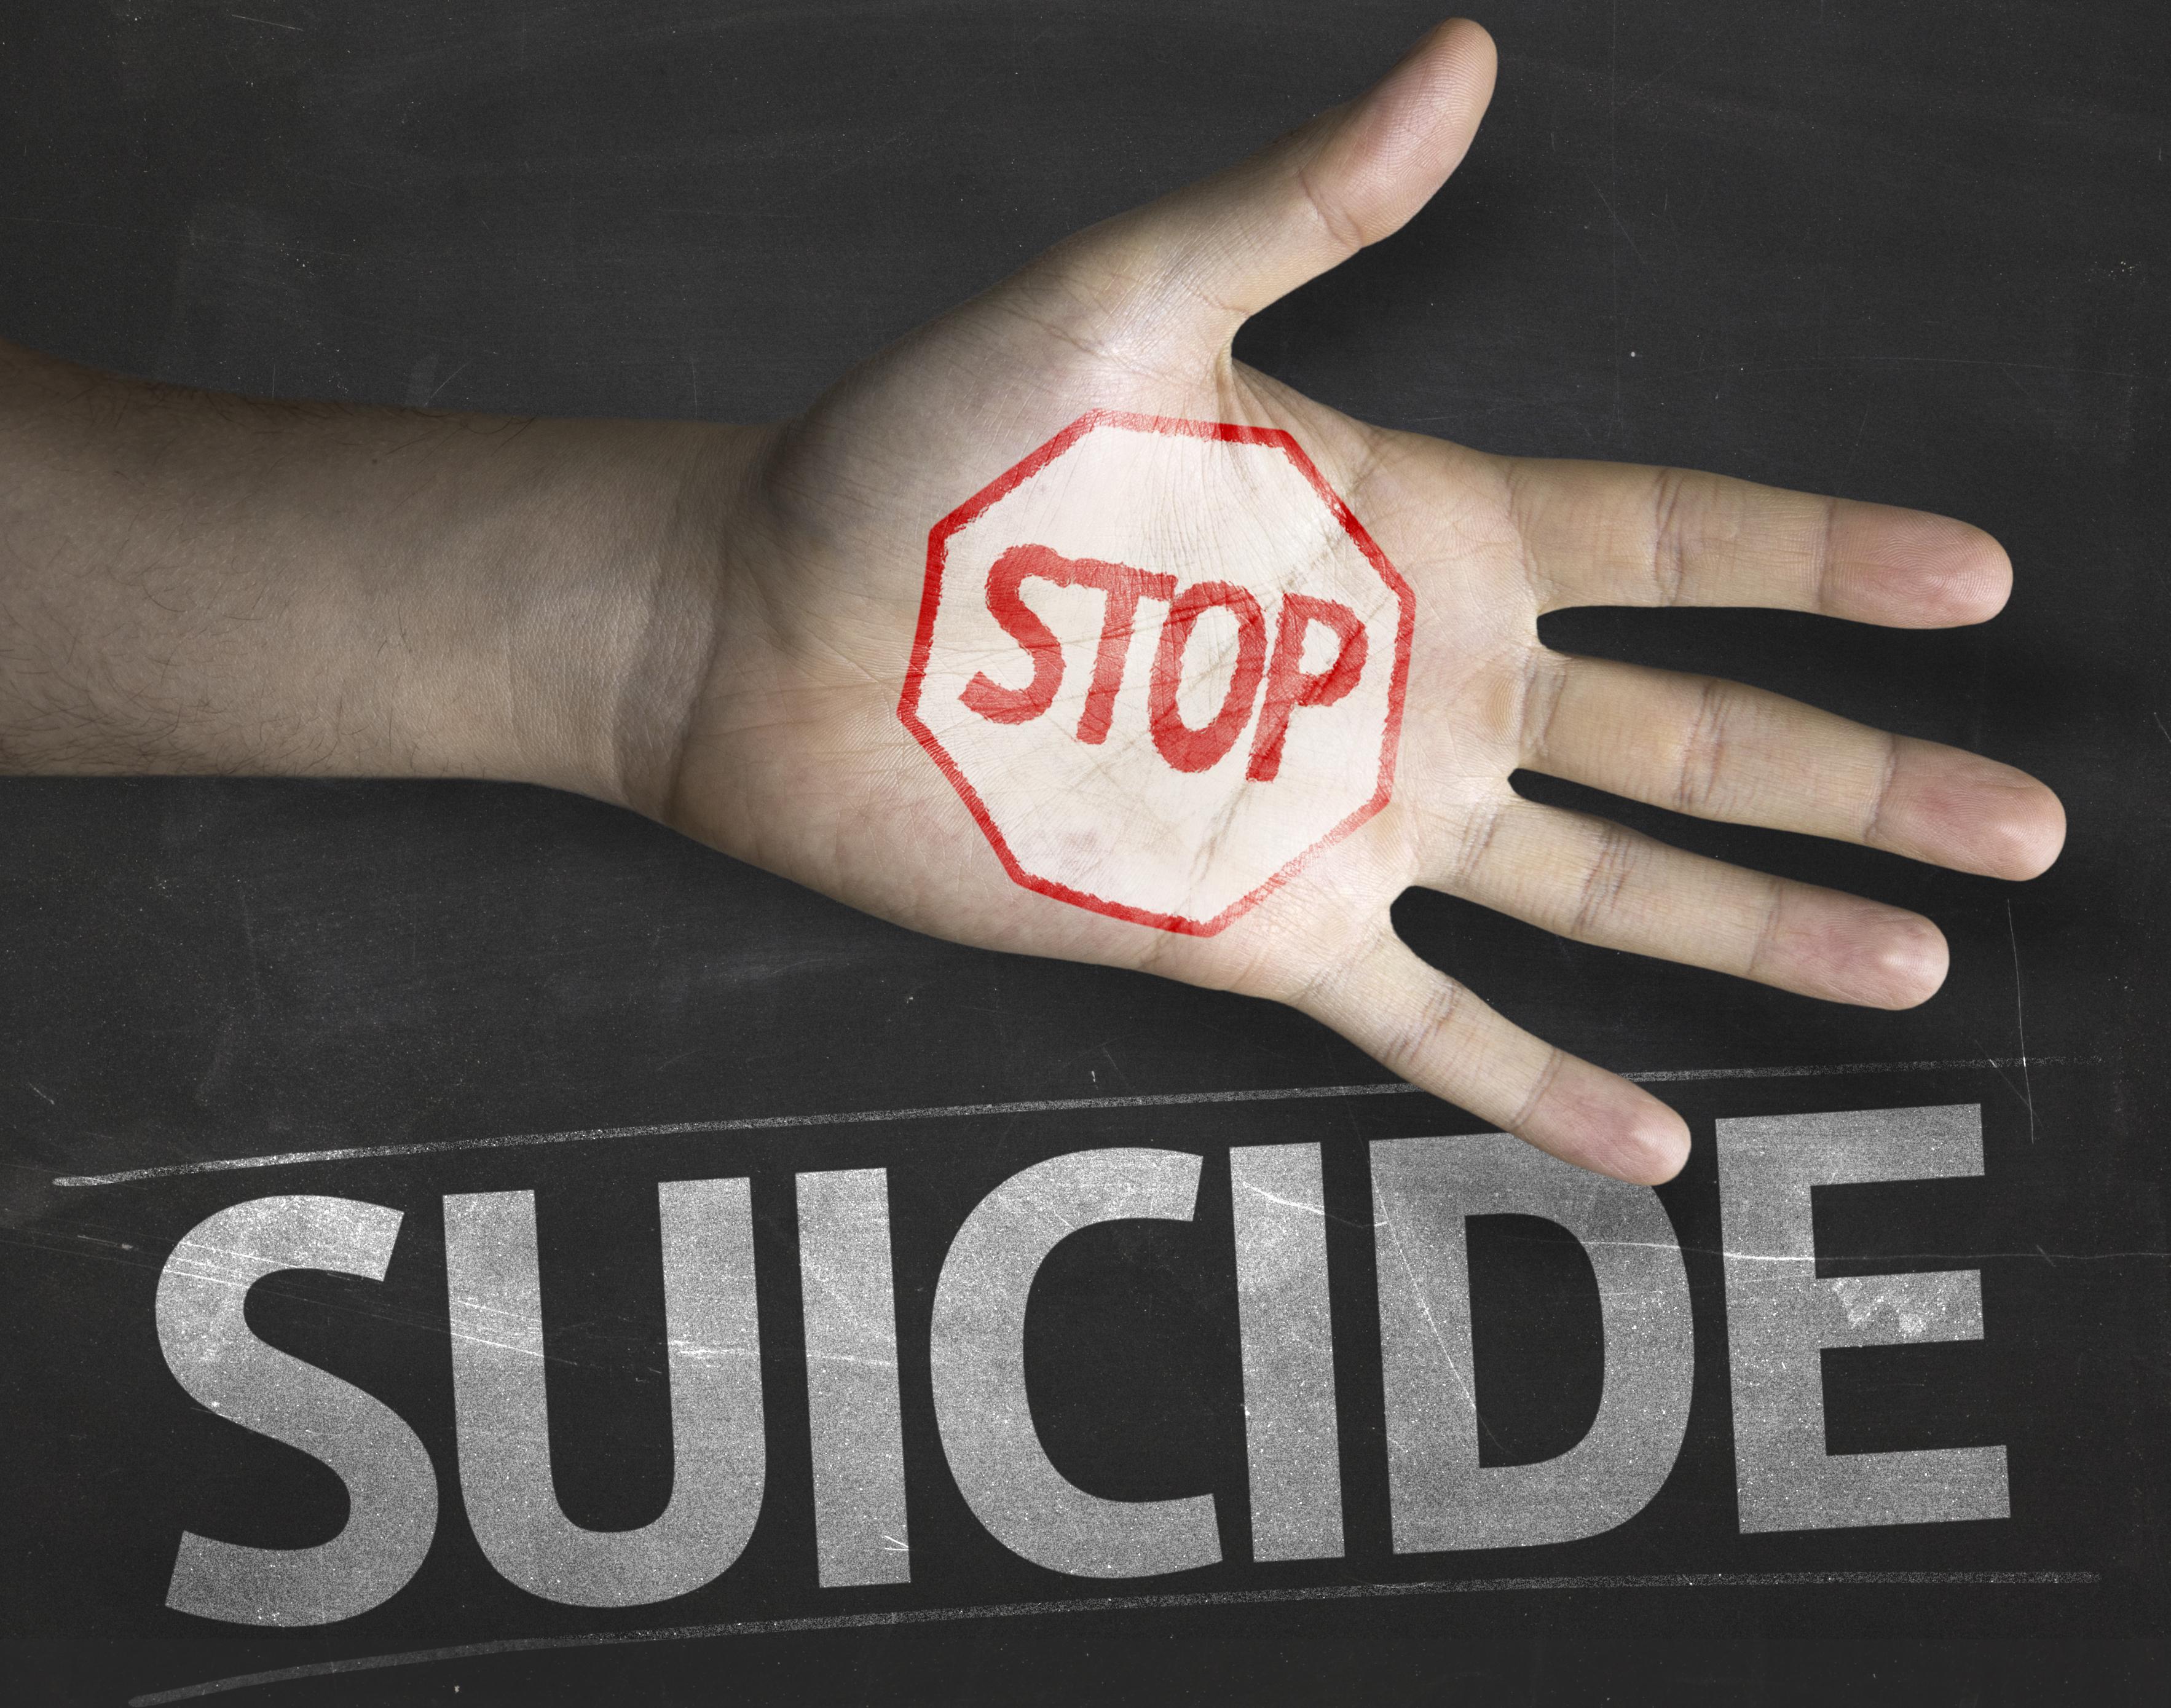 Suicide often not preceded by warnings - Harvard Health Blog